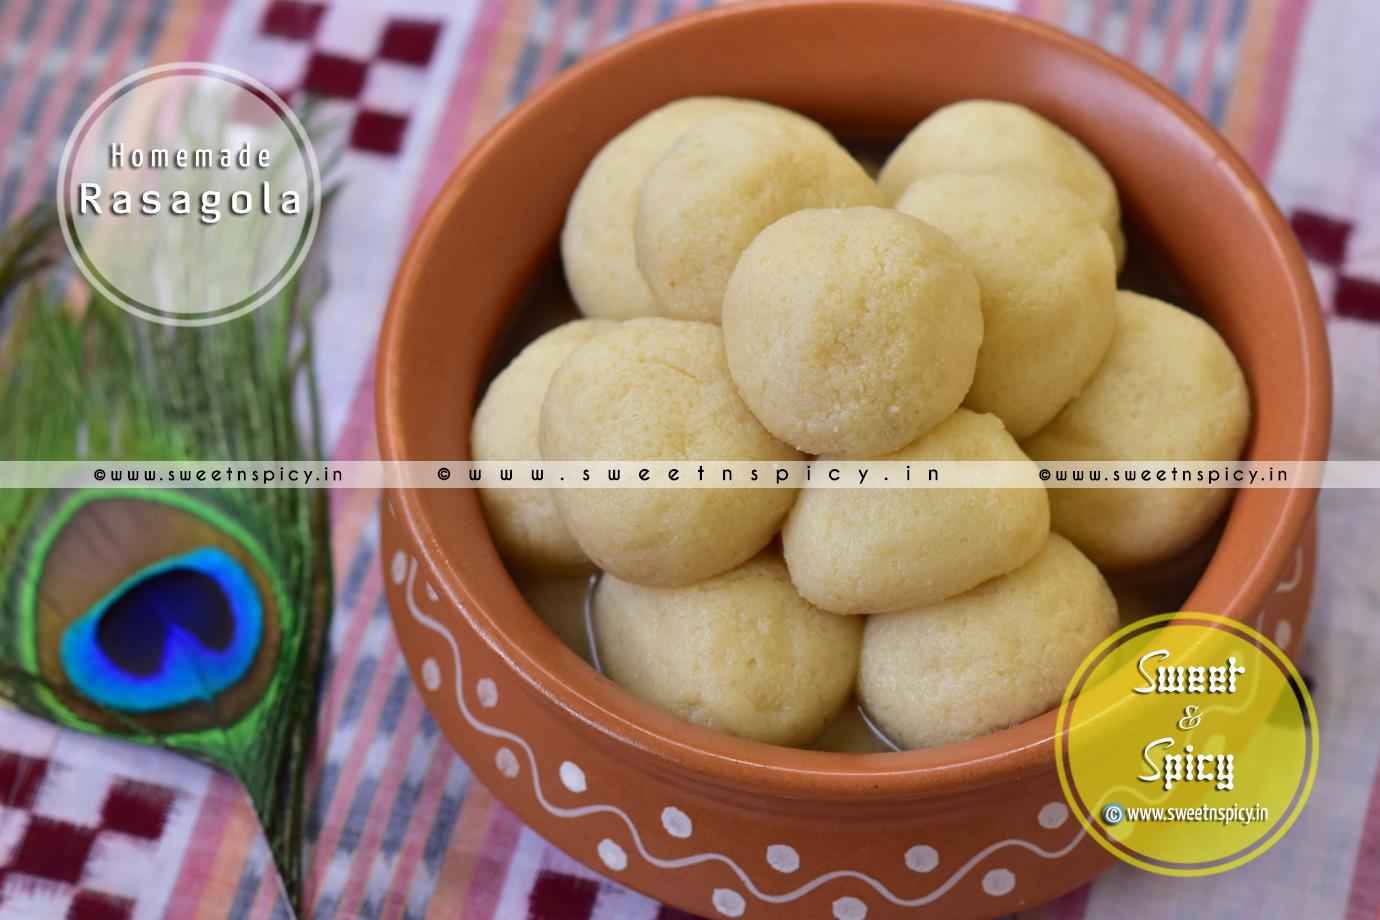 Homemade Rasagolas